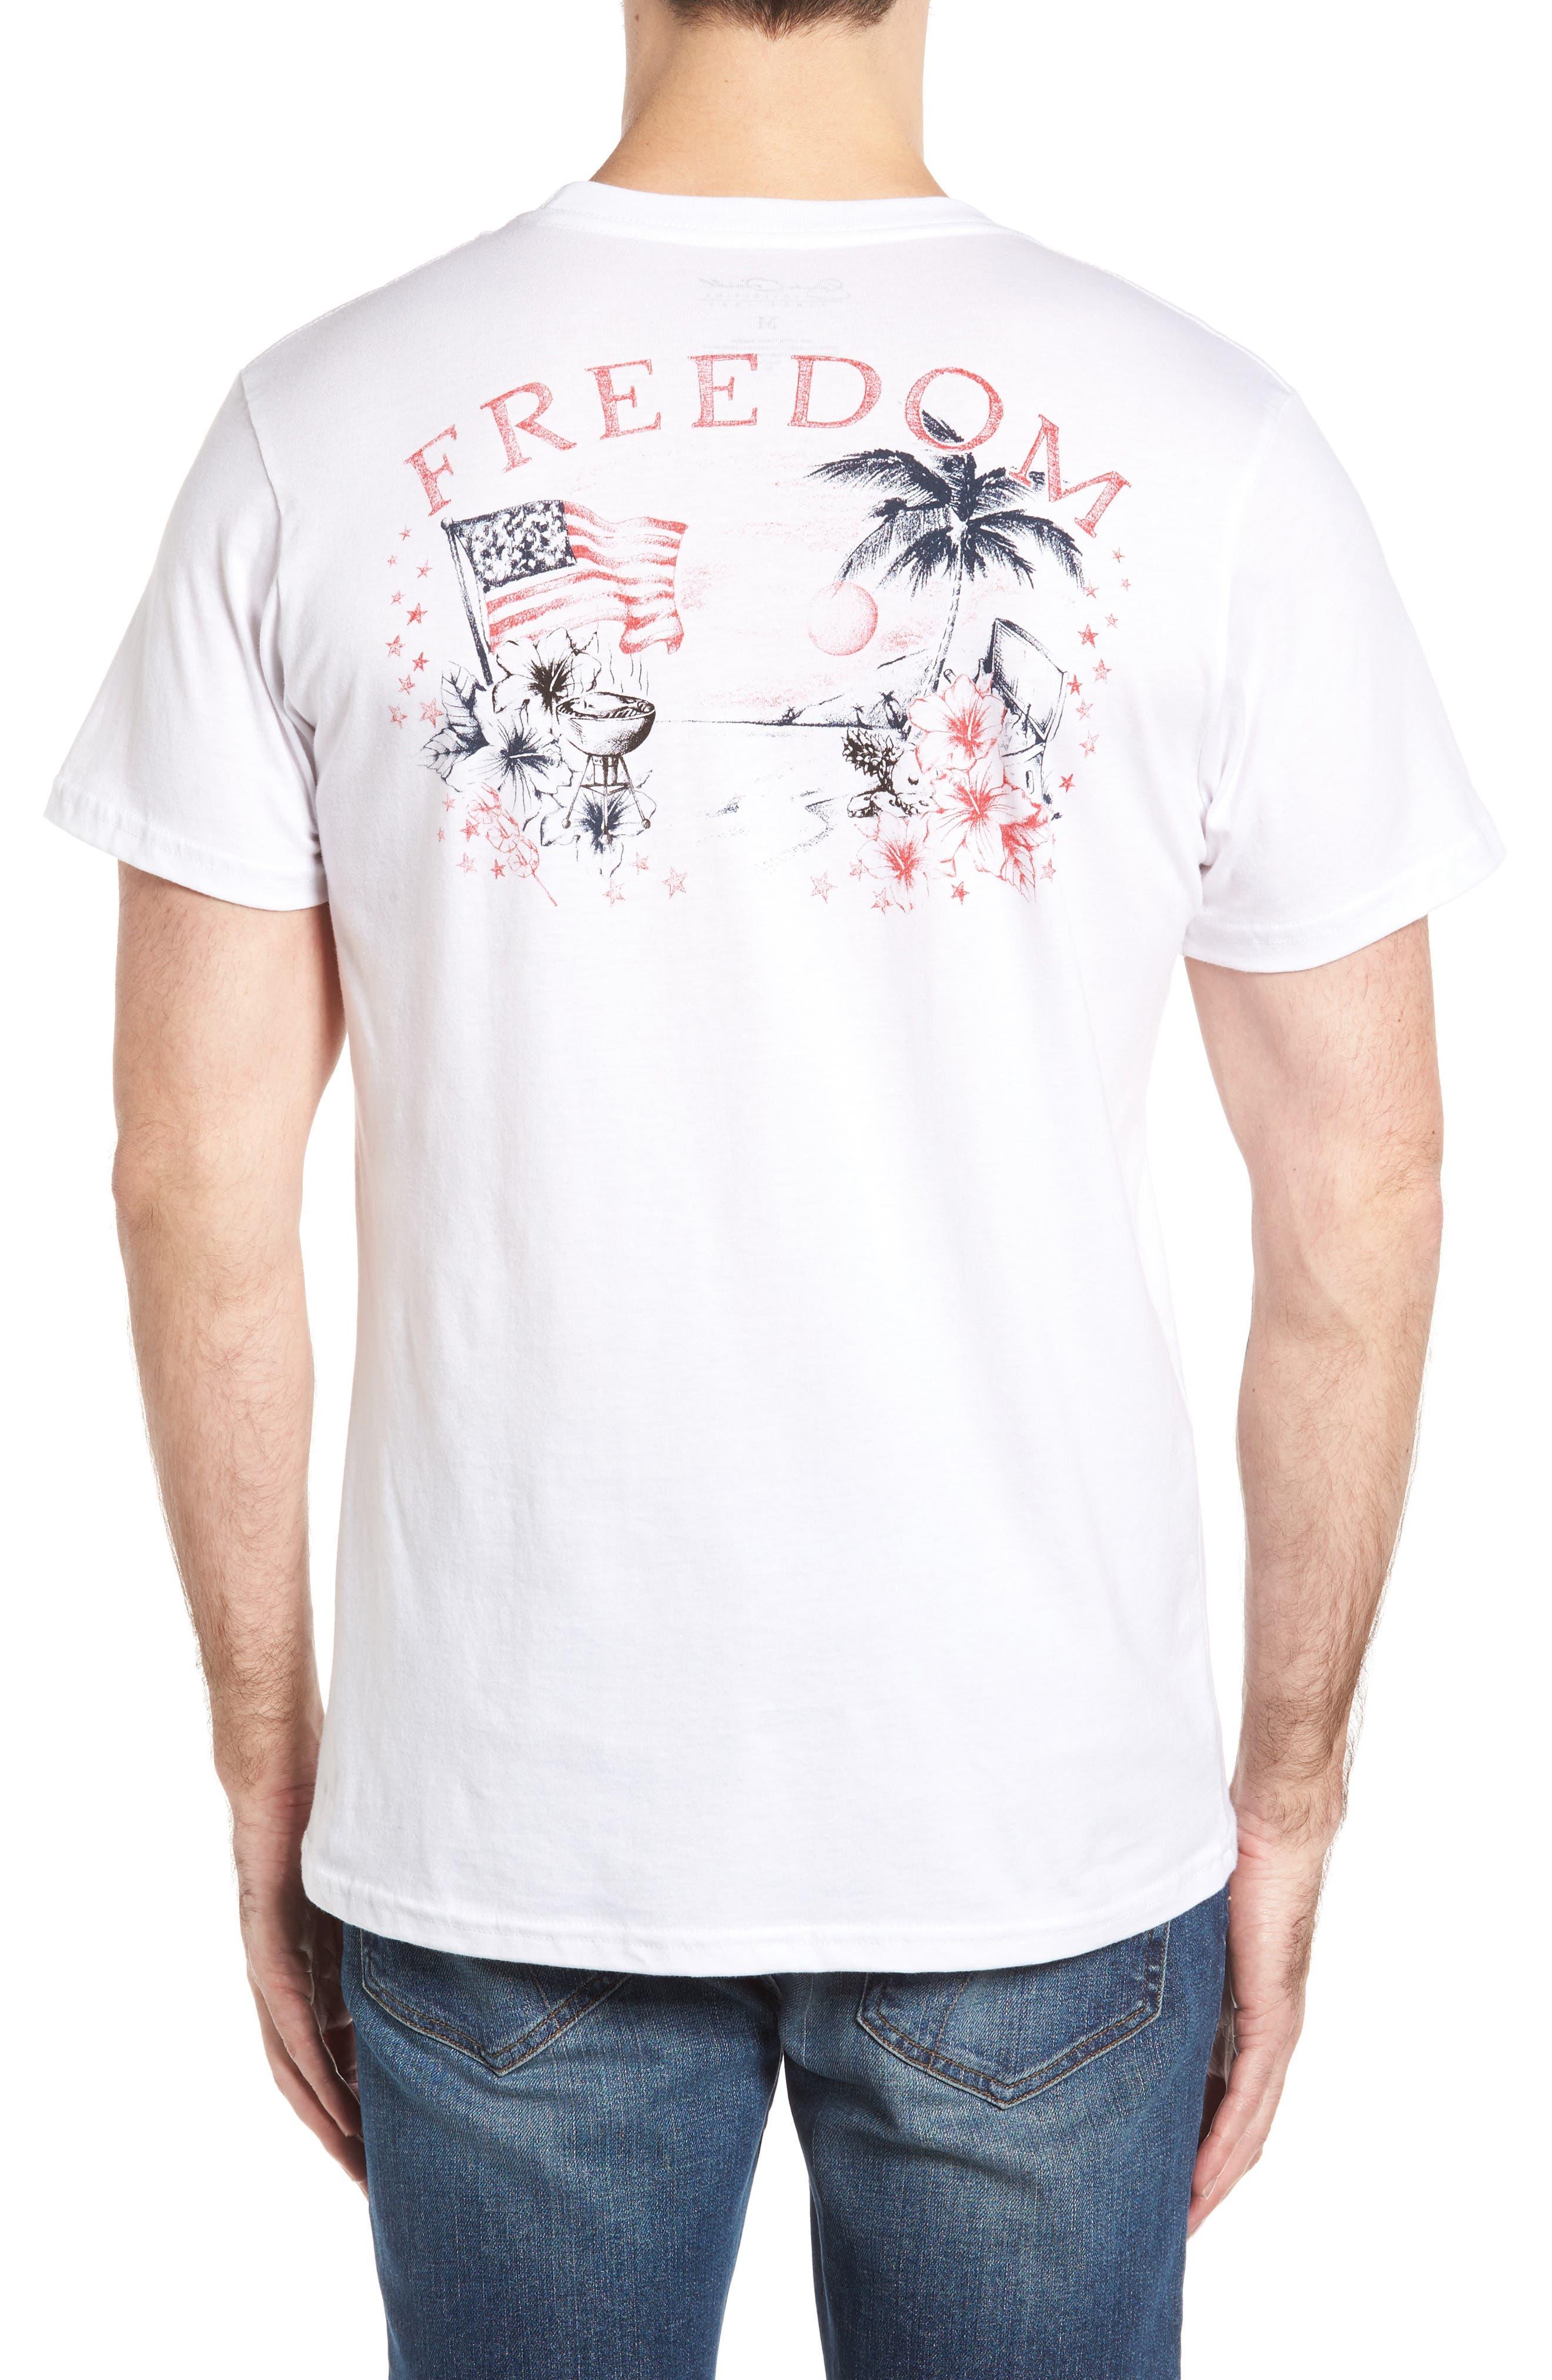 Freedom T-Shirt,                             Alternate thumbnail 2, color,                             White